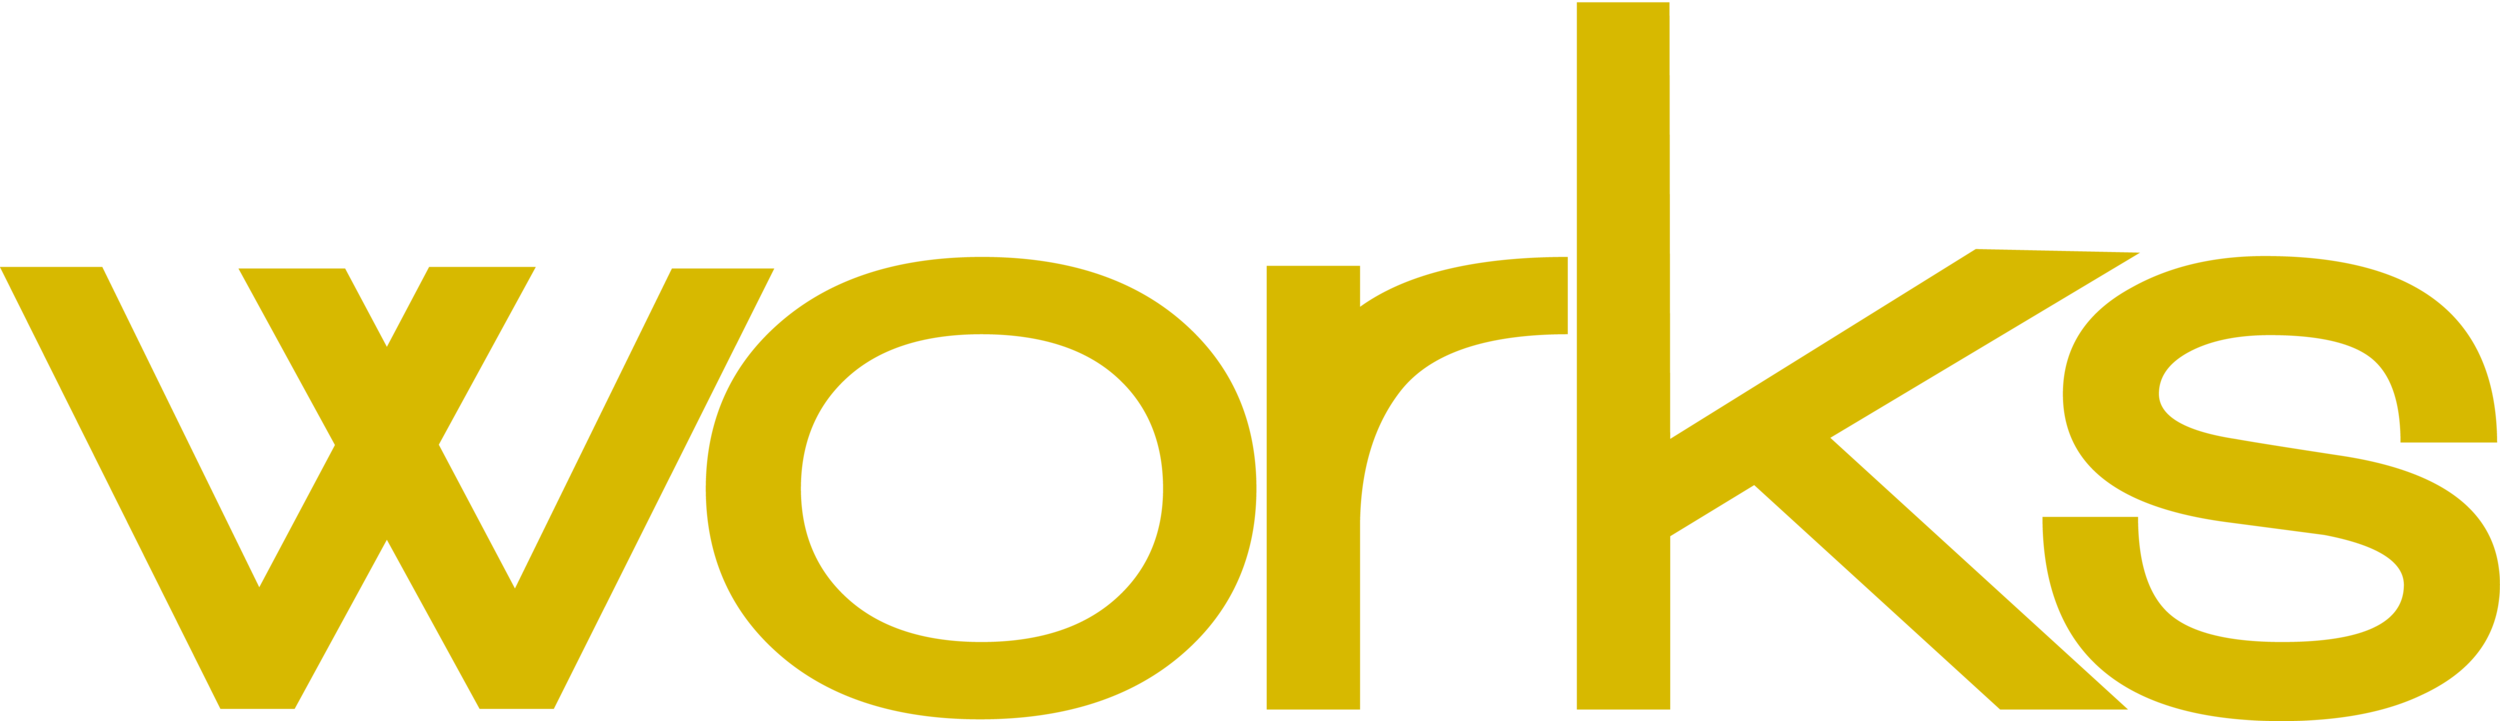 gateway-works-logo-white.png